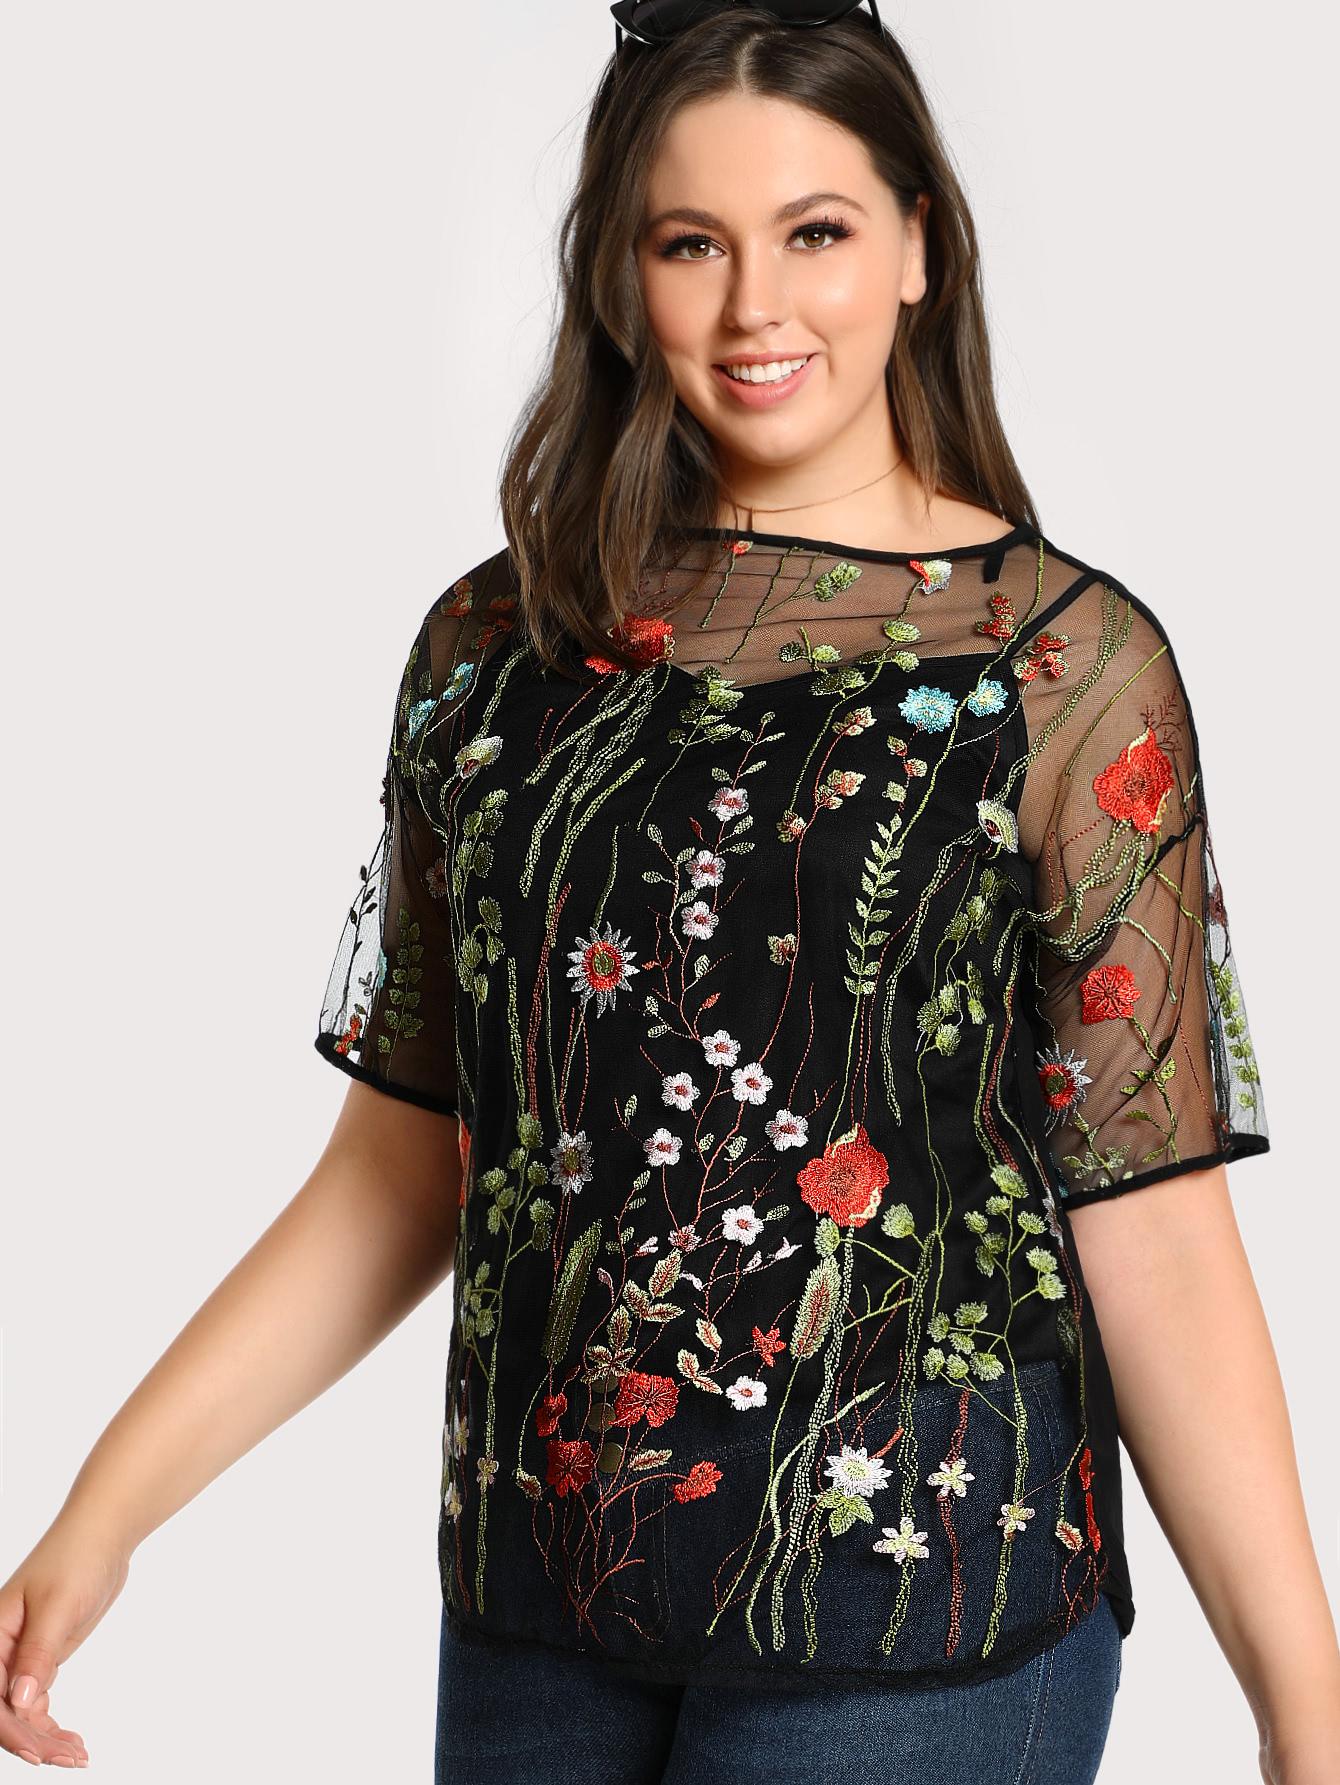 Blusas Tallas grandes por menos de 15 euros en Shein - blusas estampadas talla grande